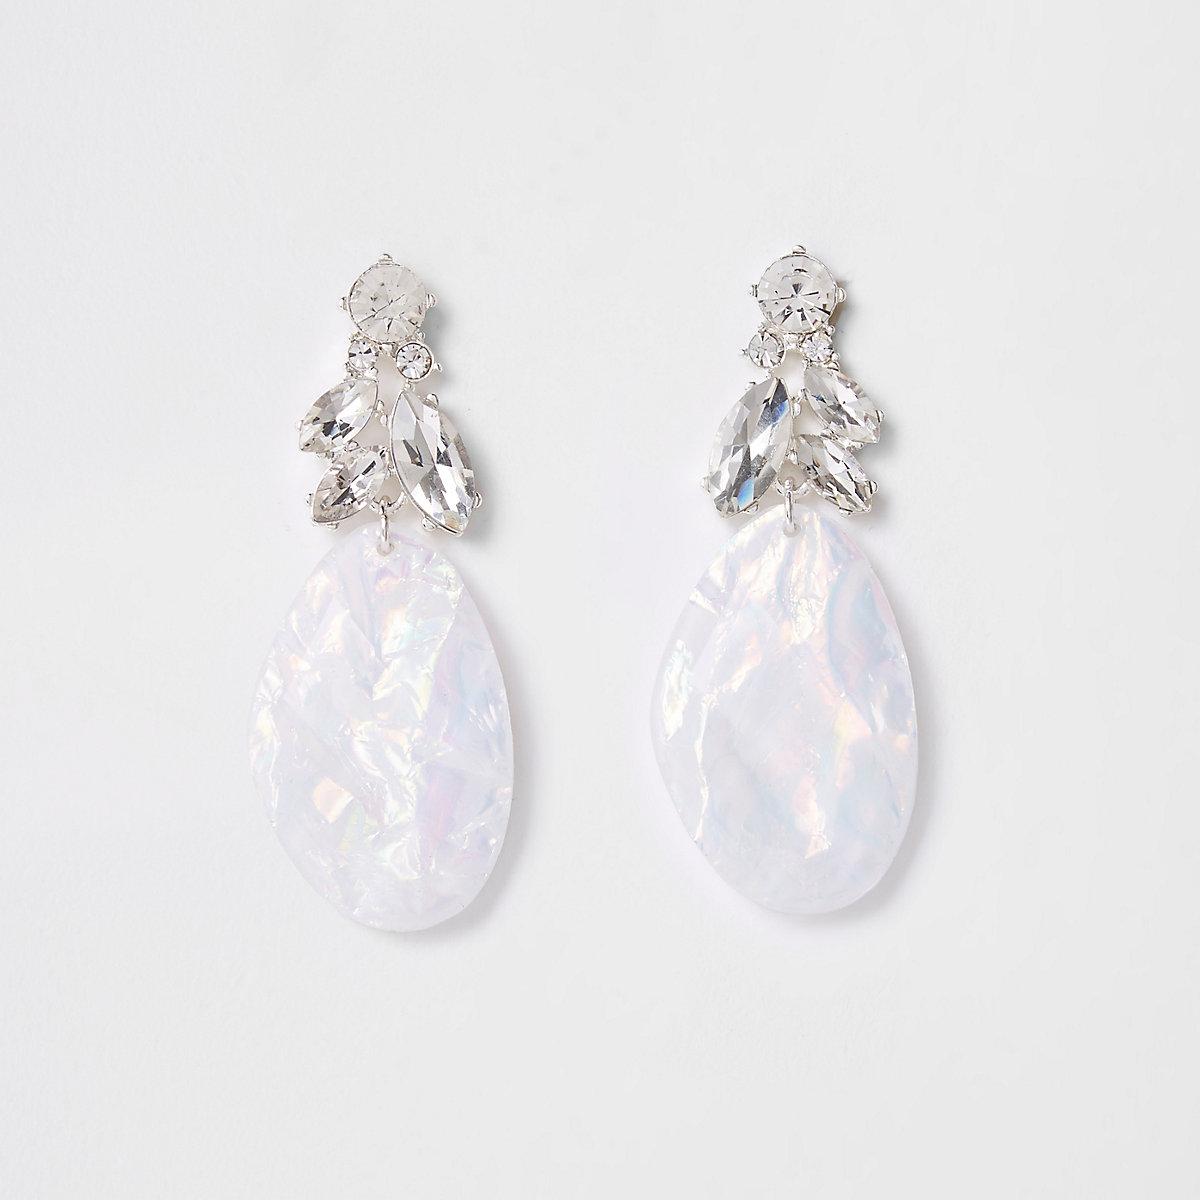 Silver tone white rhinestone drop earrings